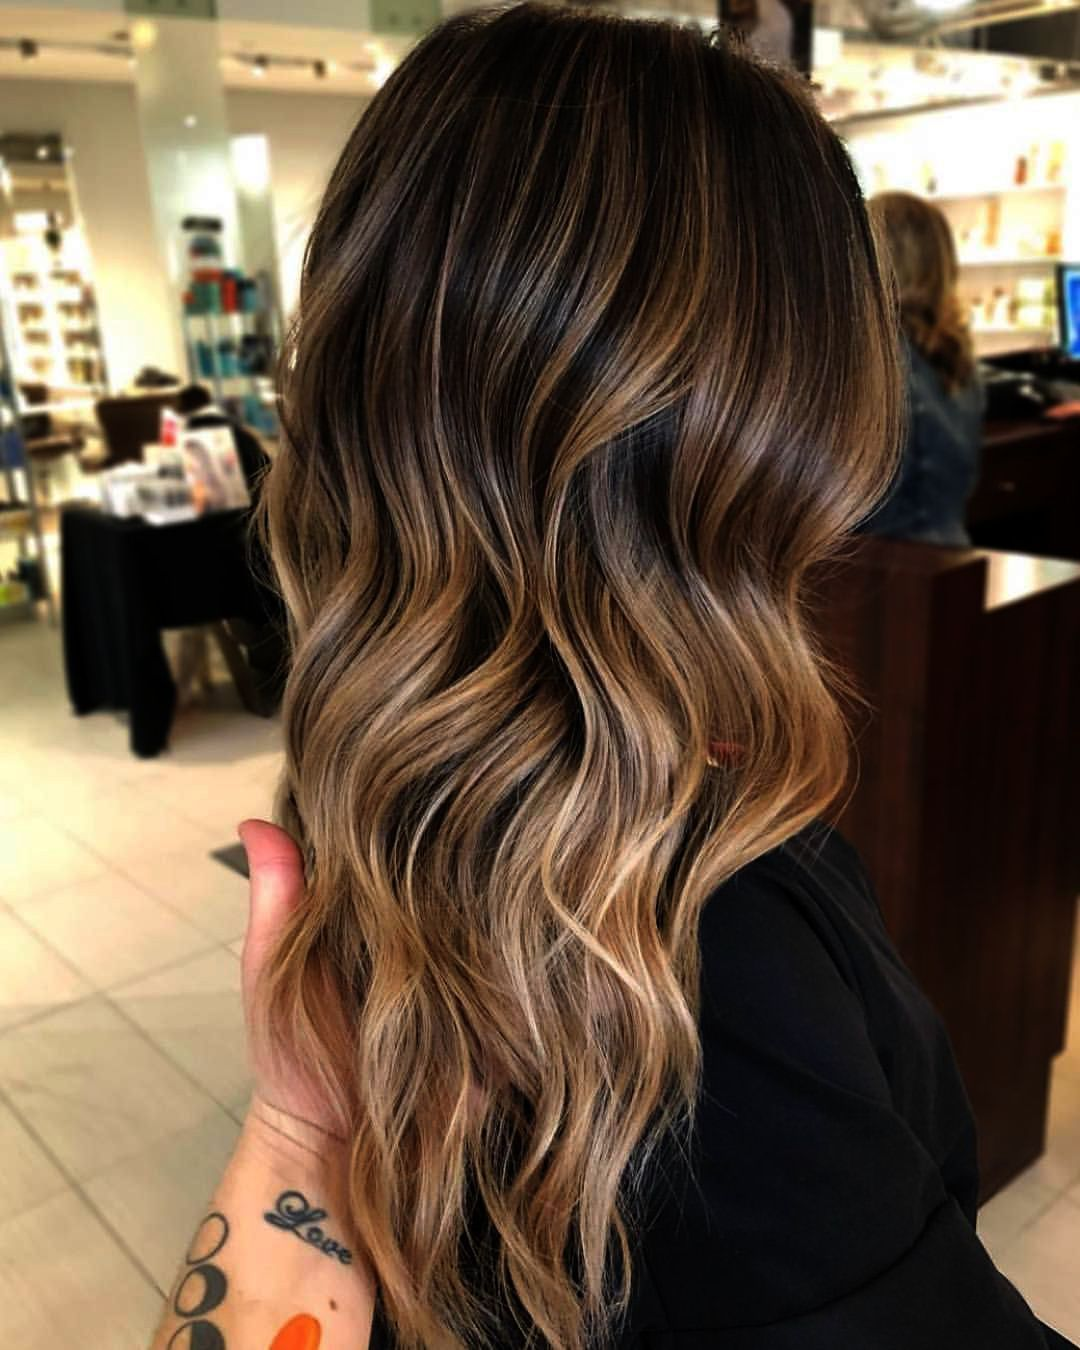 Hair Cuttery Park Ridge From Hair Salon Decor Hairstyles Curly Hair Fresh Hair Hair Styles Balayage Hair